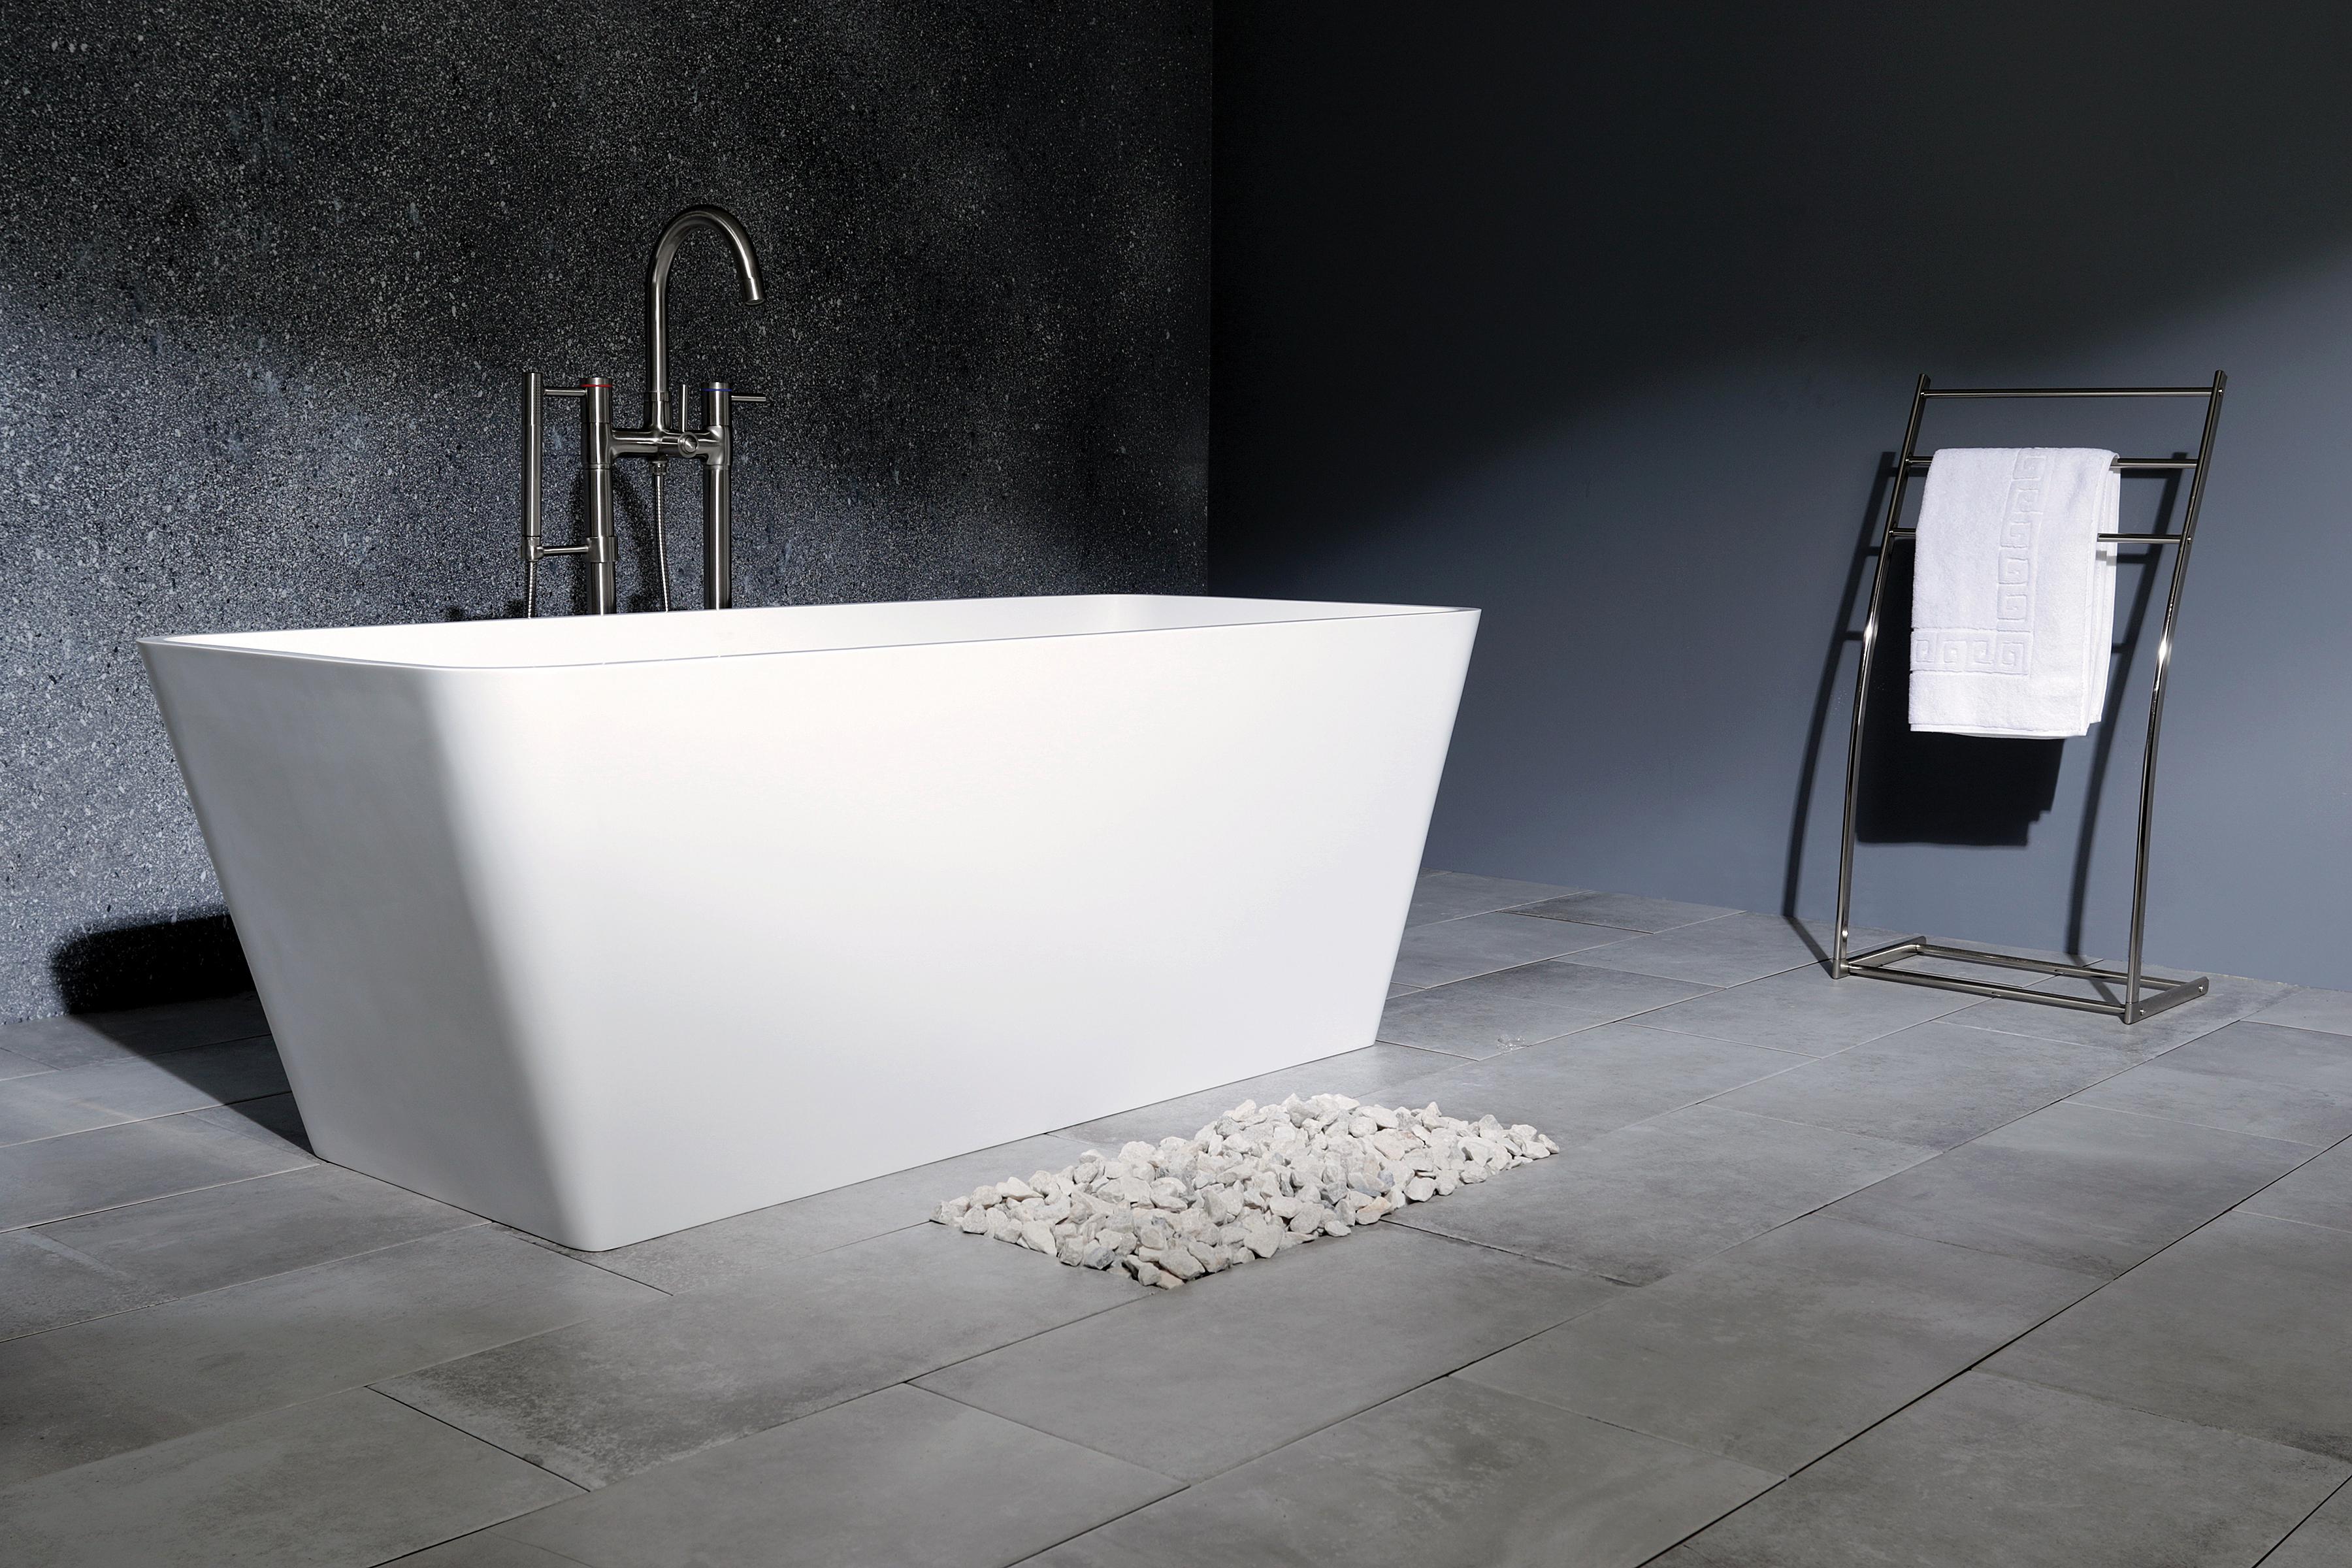 image freestanding acrylic high illusa res ilusa bathtub product resolution mirolin